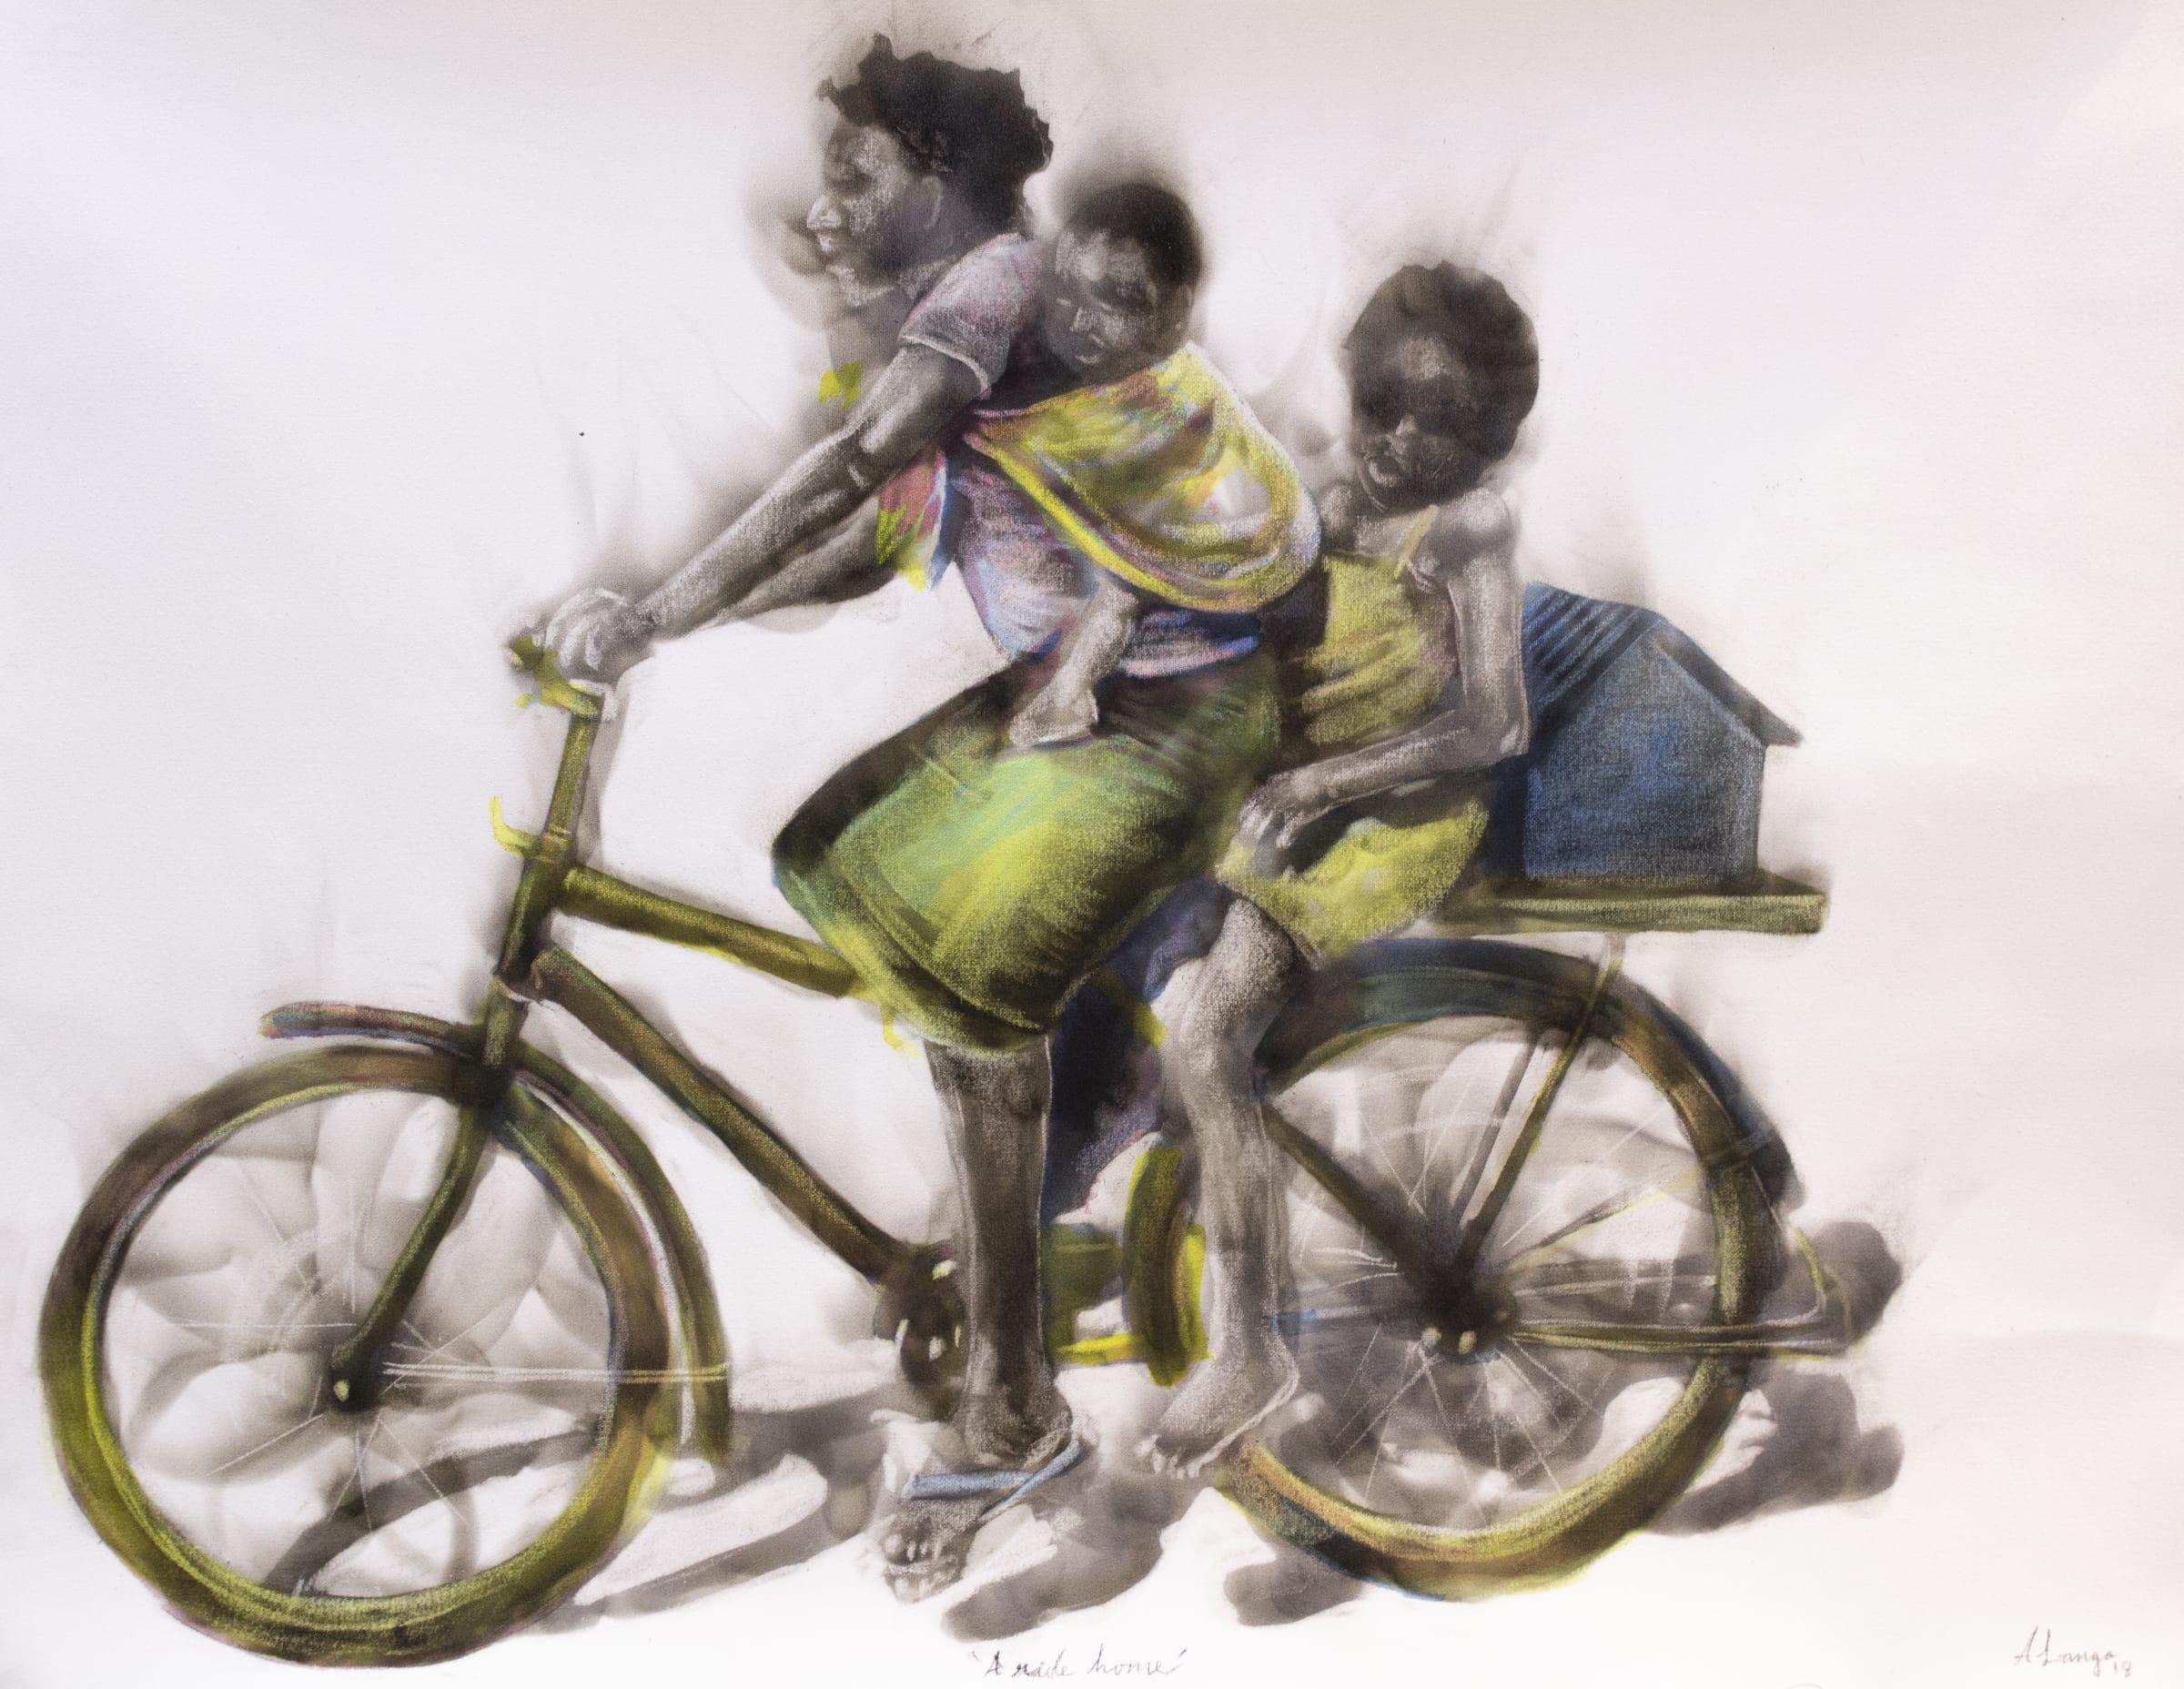 <span class=&#34;link fancybox-details-link&#34;><a href=&#34;/artists/54-azael-langa/works/2113-azael-langa-a-ride-home-2018/&#34;>View Detail Page</a></span><div class=&#34;artist&#34;><strong>Azael Langa</strong></div> <div class=&#34;title&#34;><em>A Ride Home</em>, 2018</div> <div class=&#34;medium&#34;>Smoke And Ink  On Canvas</div> <div class=&#34;dimensions&#34;>80cm x 101cm (97cm x 118cm framed)</div>